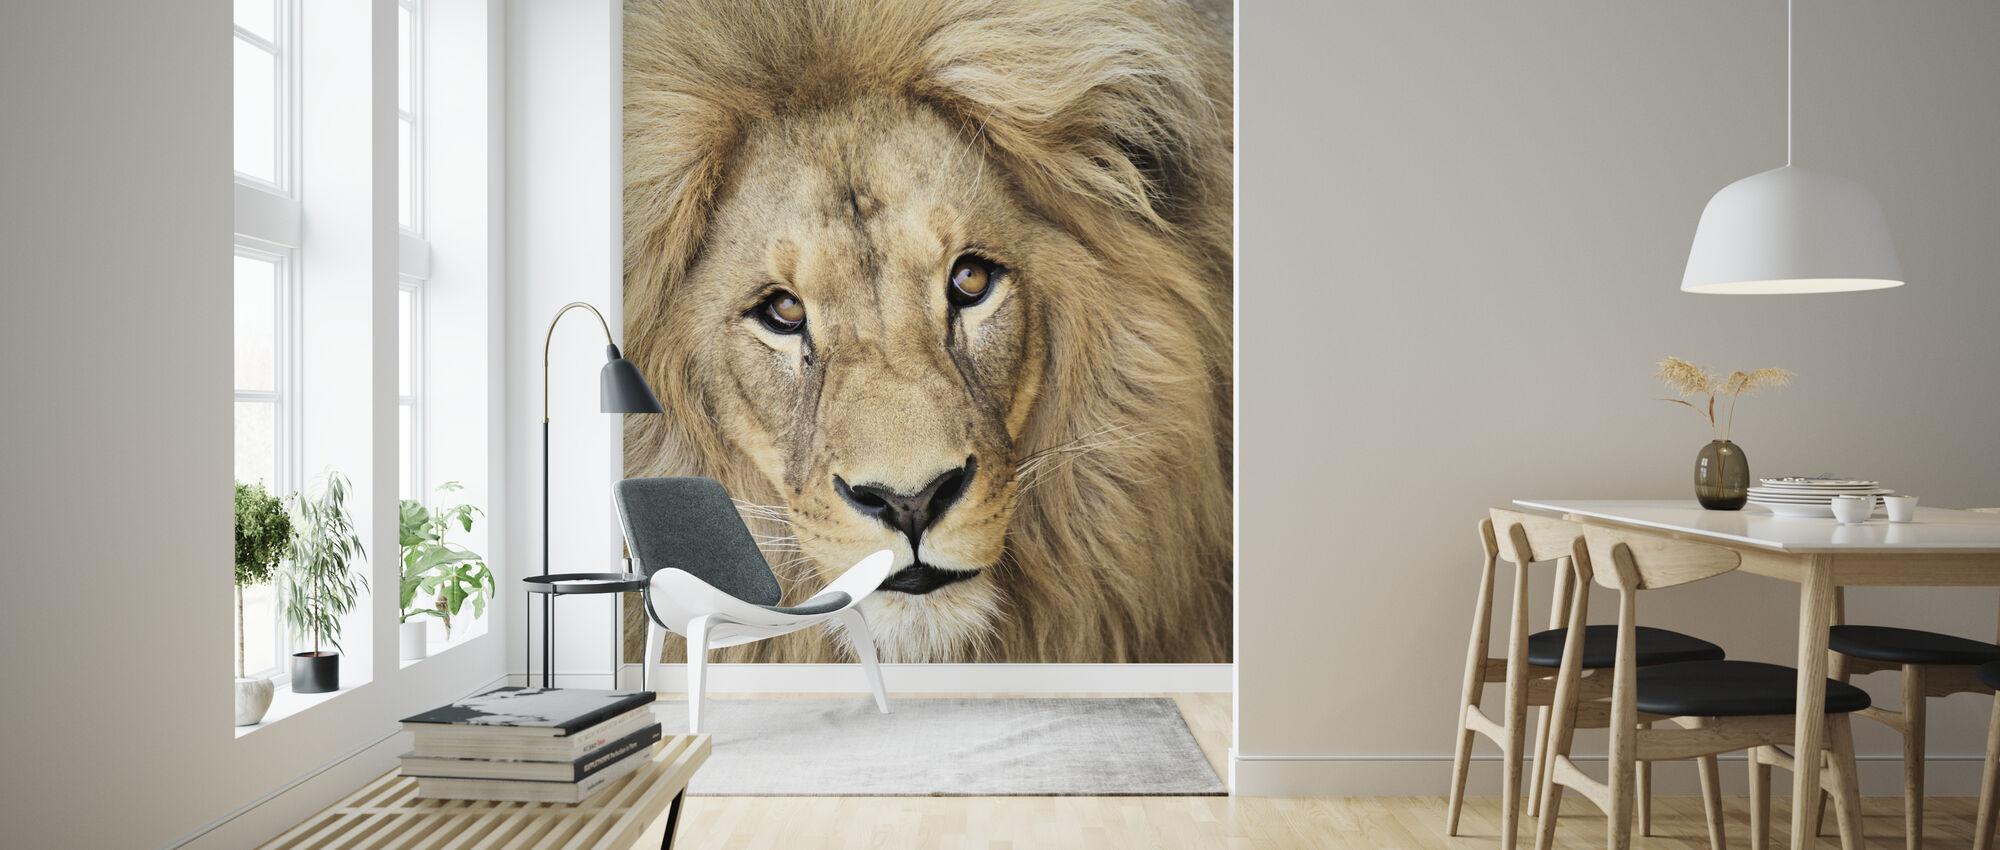 Lions Face - Wallpaper - Living Room